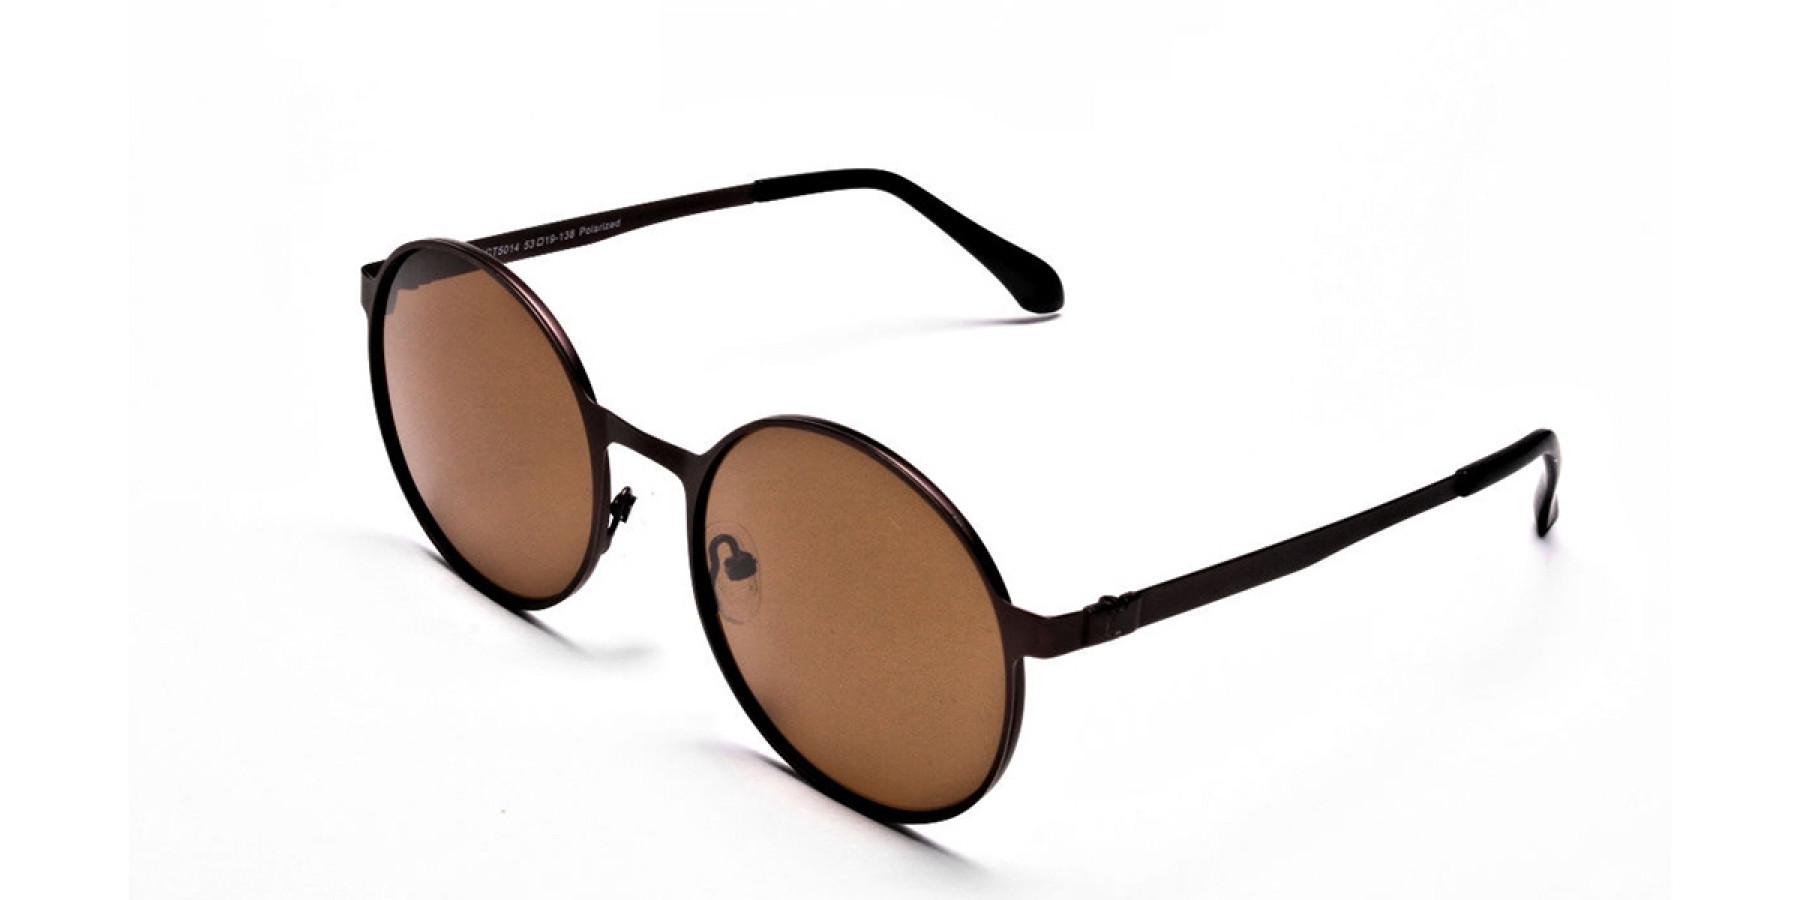 Brown Sunglasses in Round Online - 2